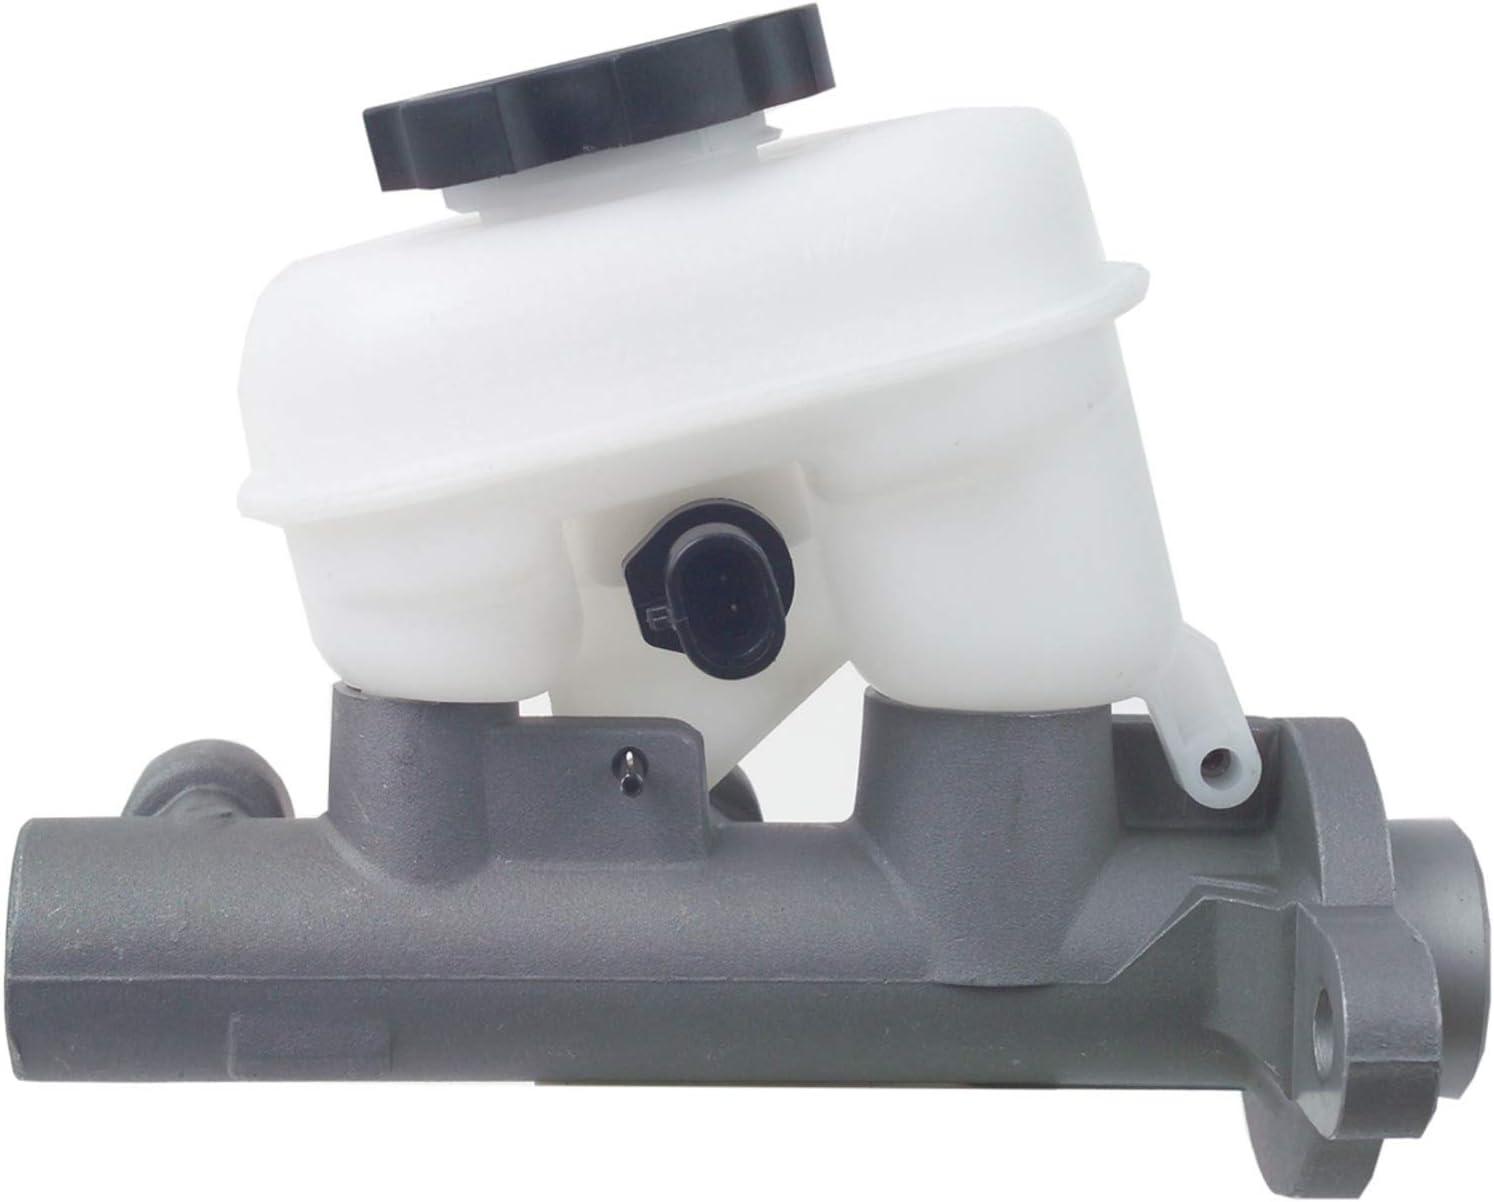 Cardone 13-2926 New Cylinder Brake Master Very Max 82% OFF popular